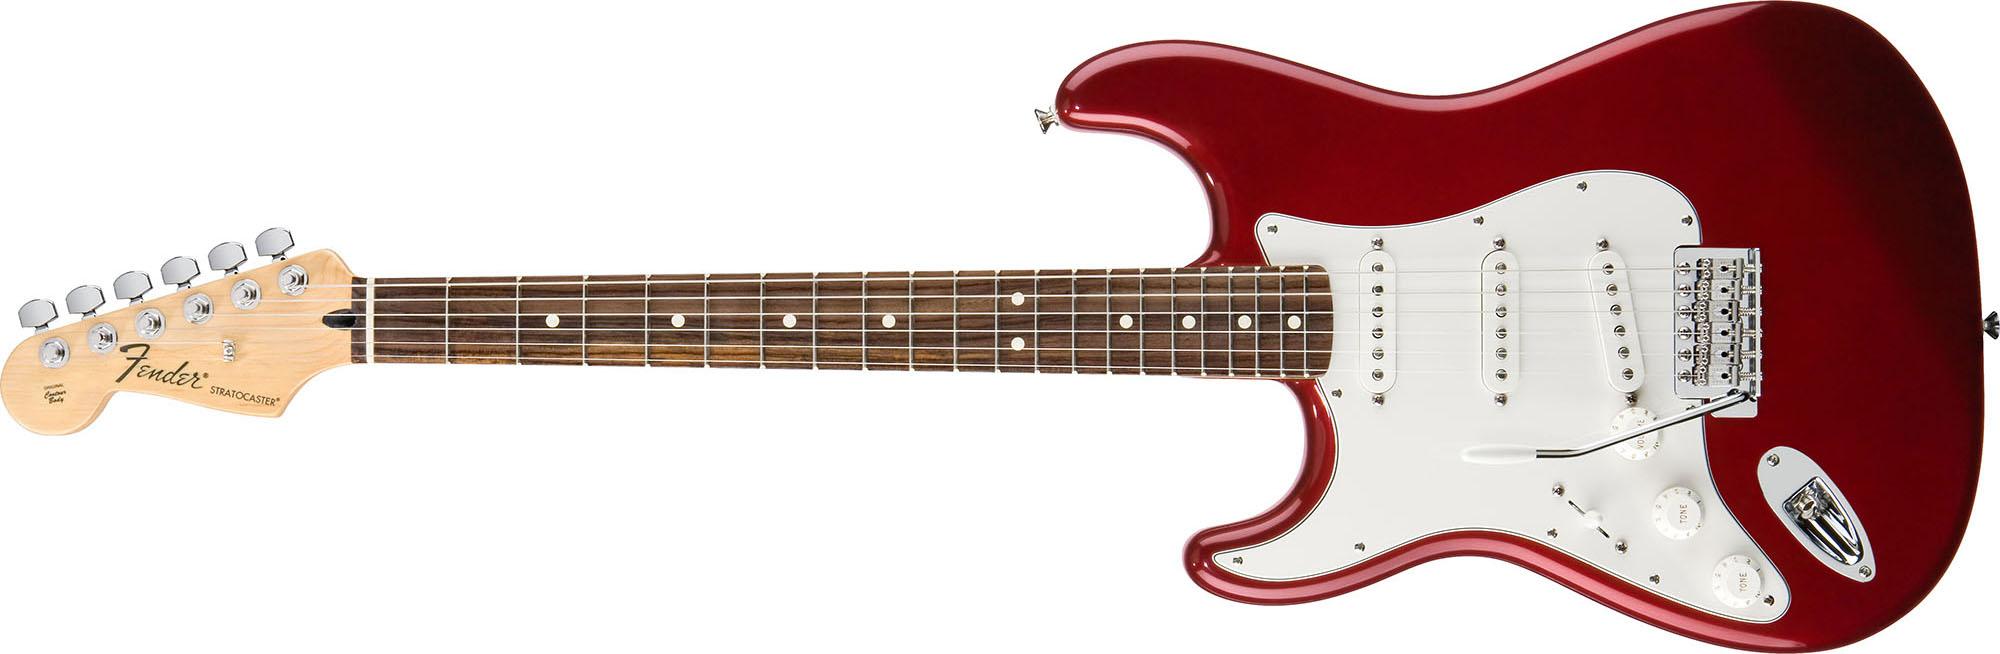 fender品牌_电吉他_standard